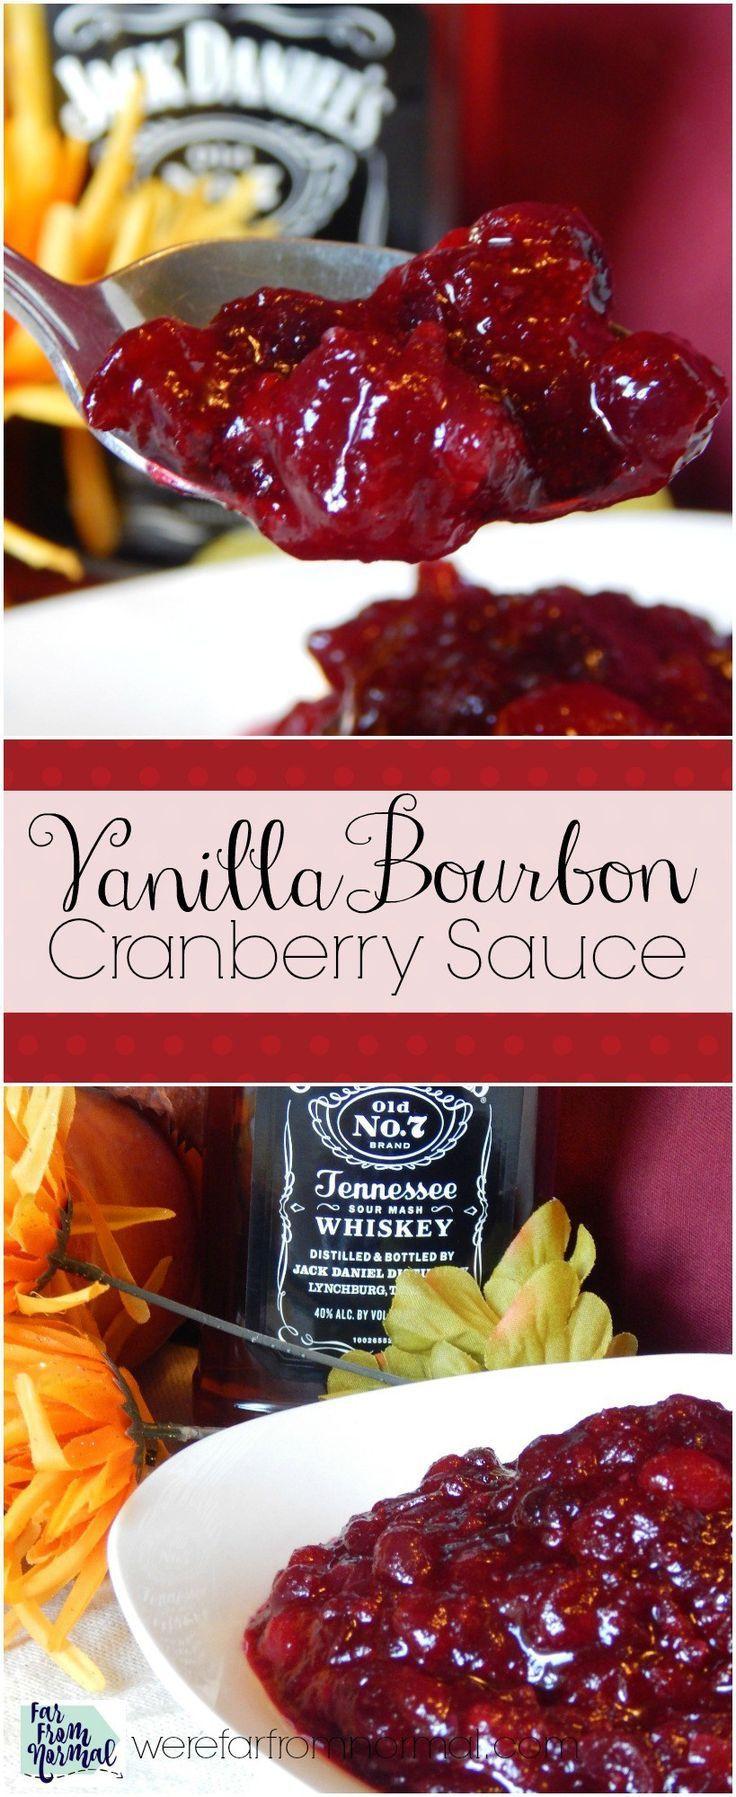 Cranberry Recipes For Thanksgiving  Vanilla Bourbon Cranberry Sauce